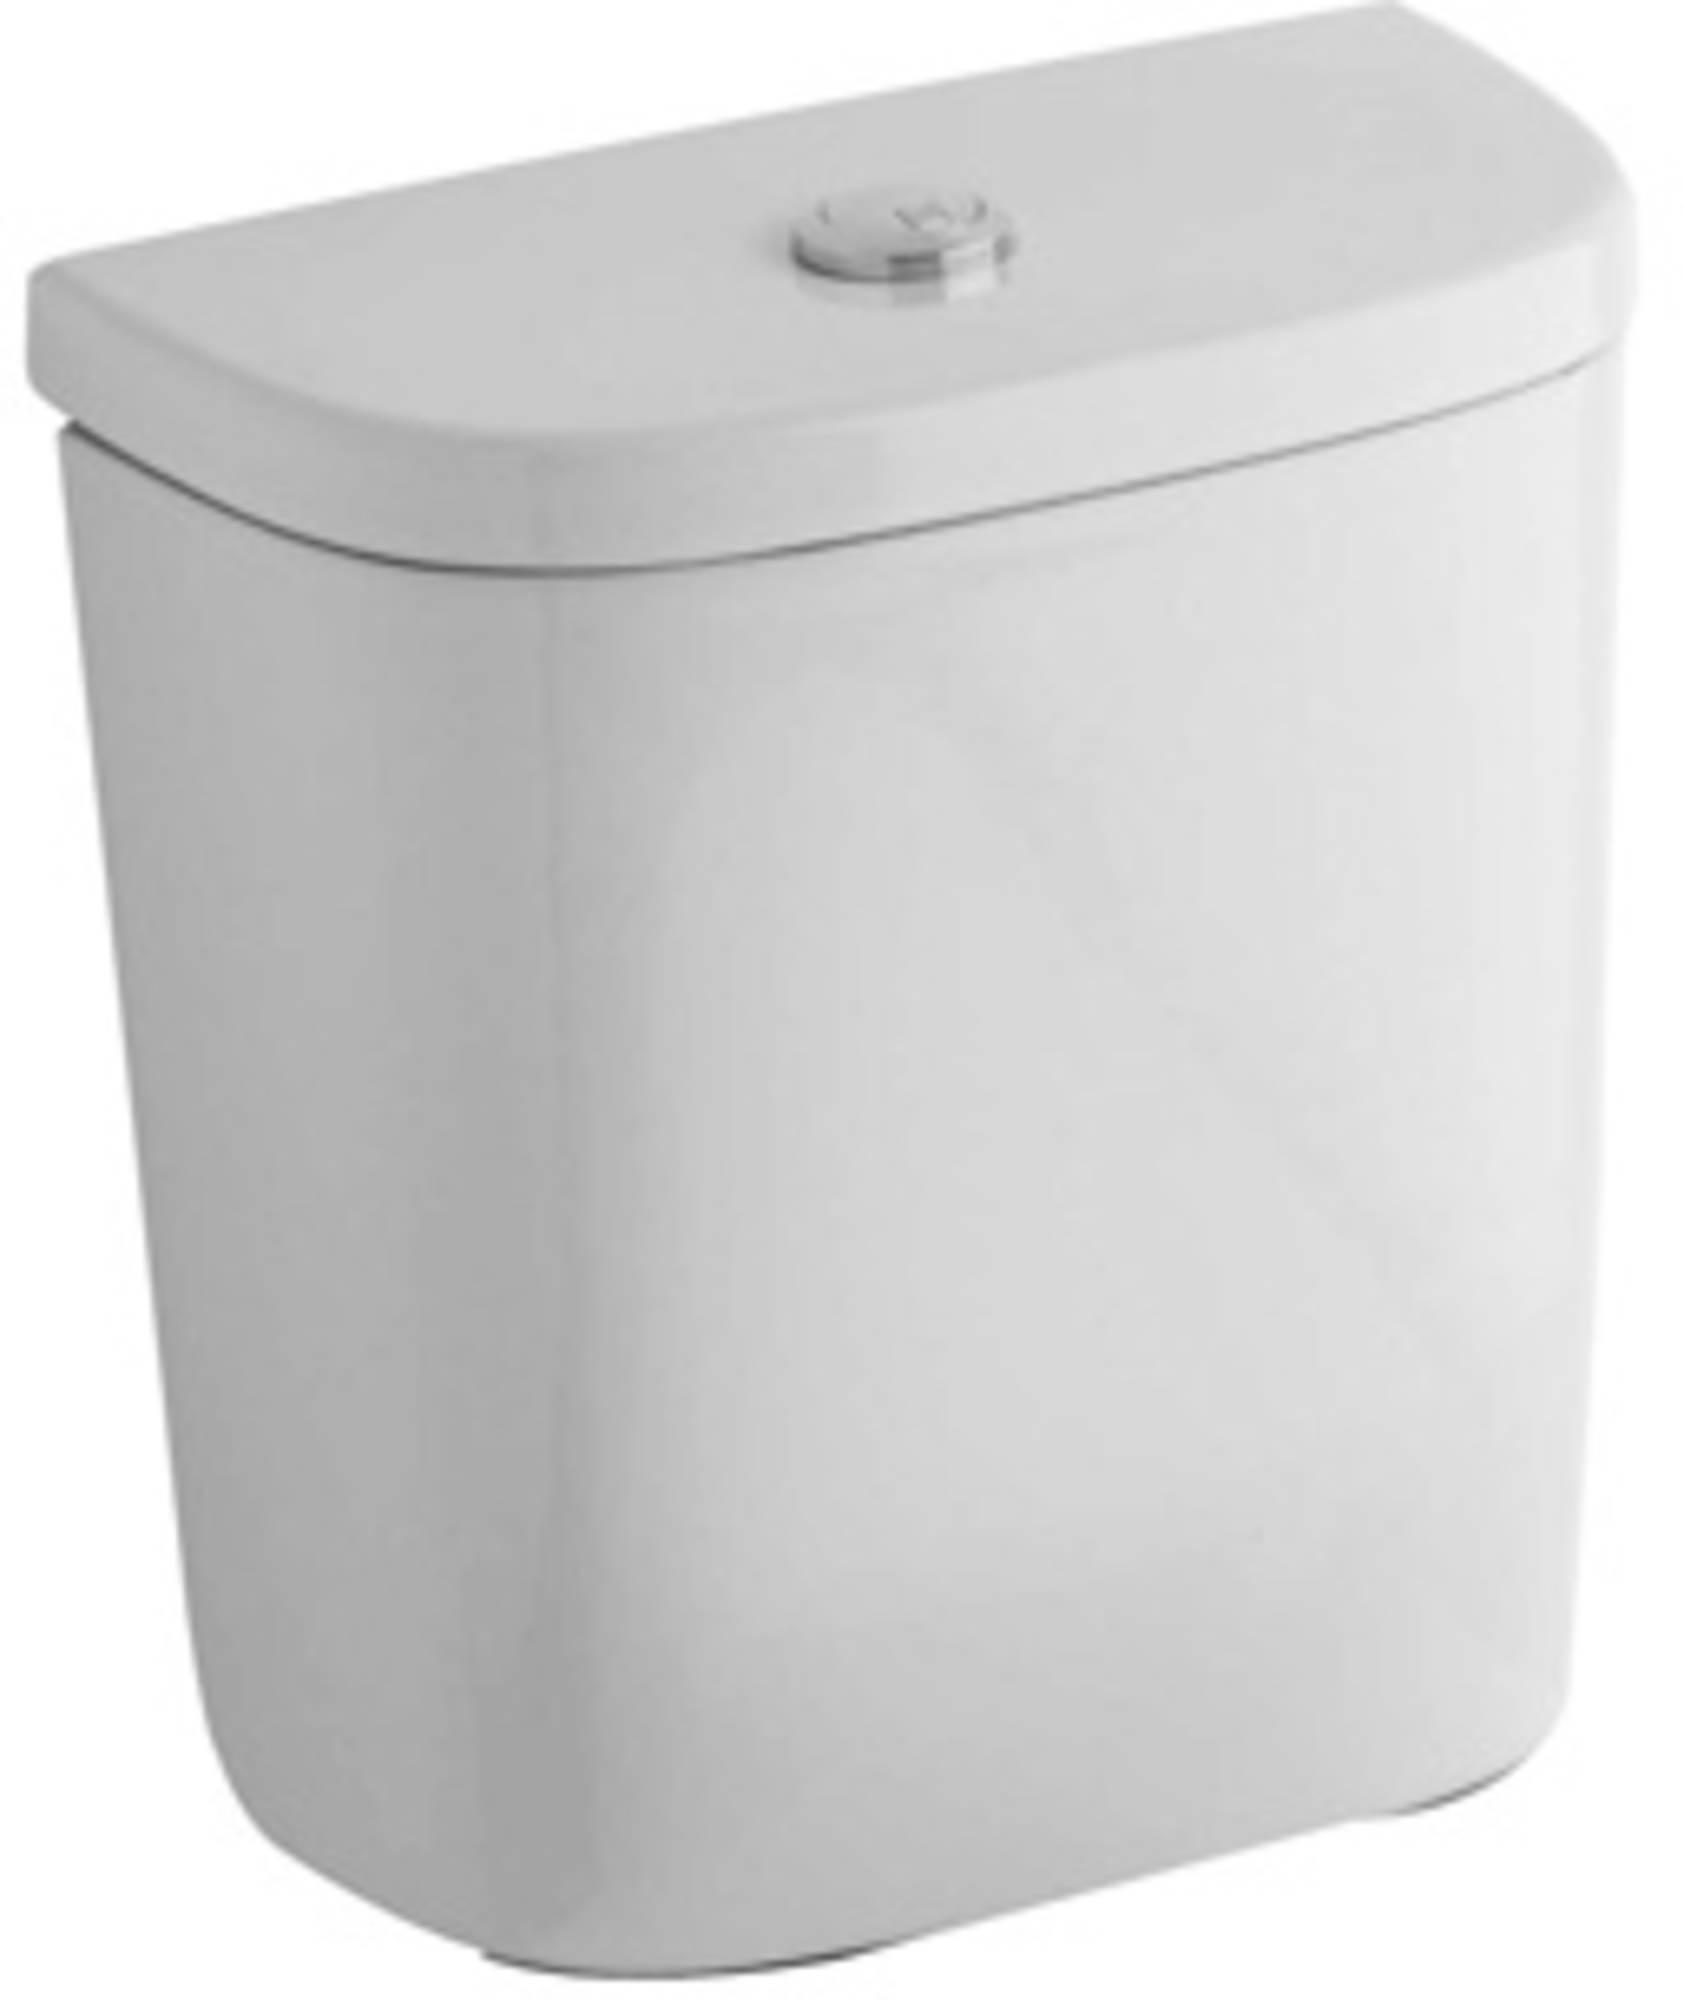 Sphinx Serie 300 basic reservoir compleet onderinlaat, wit